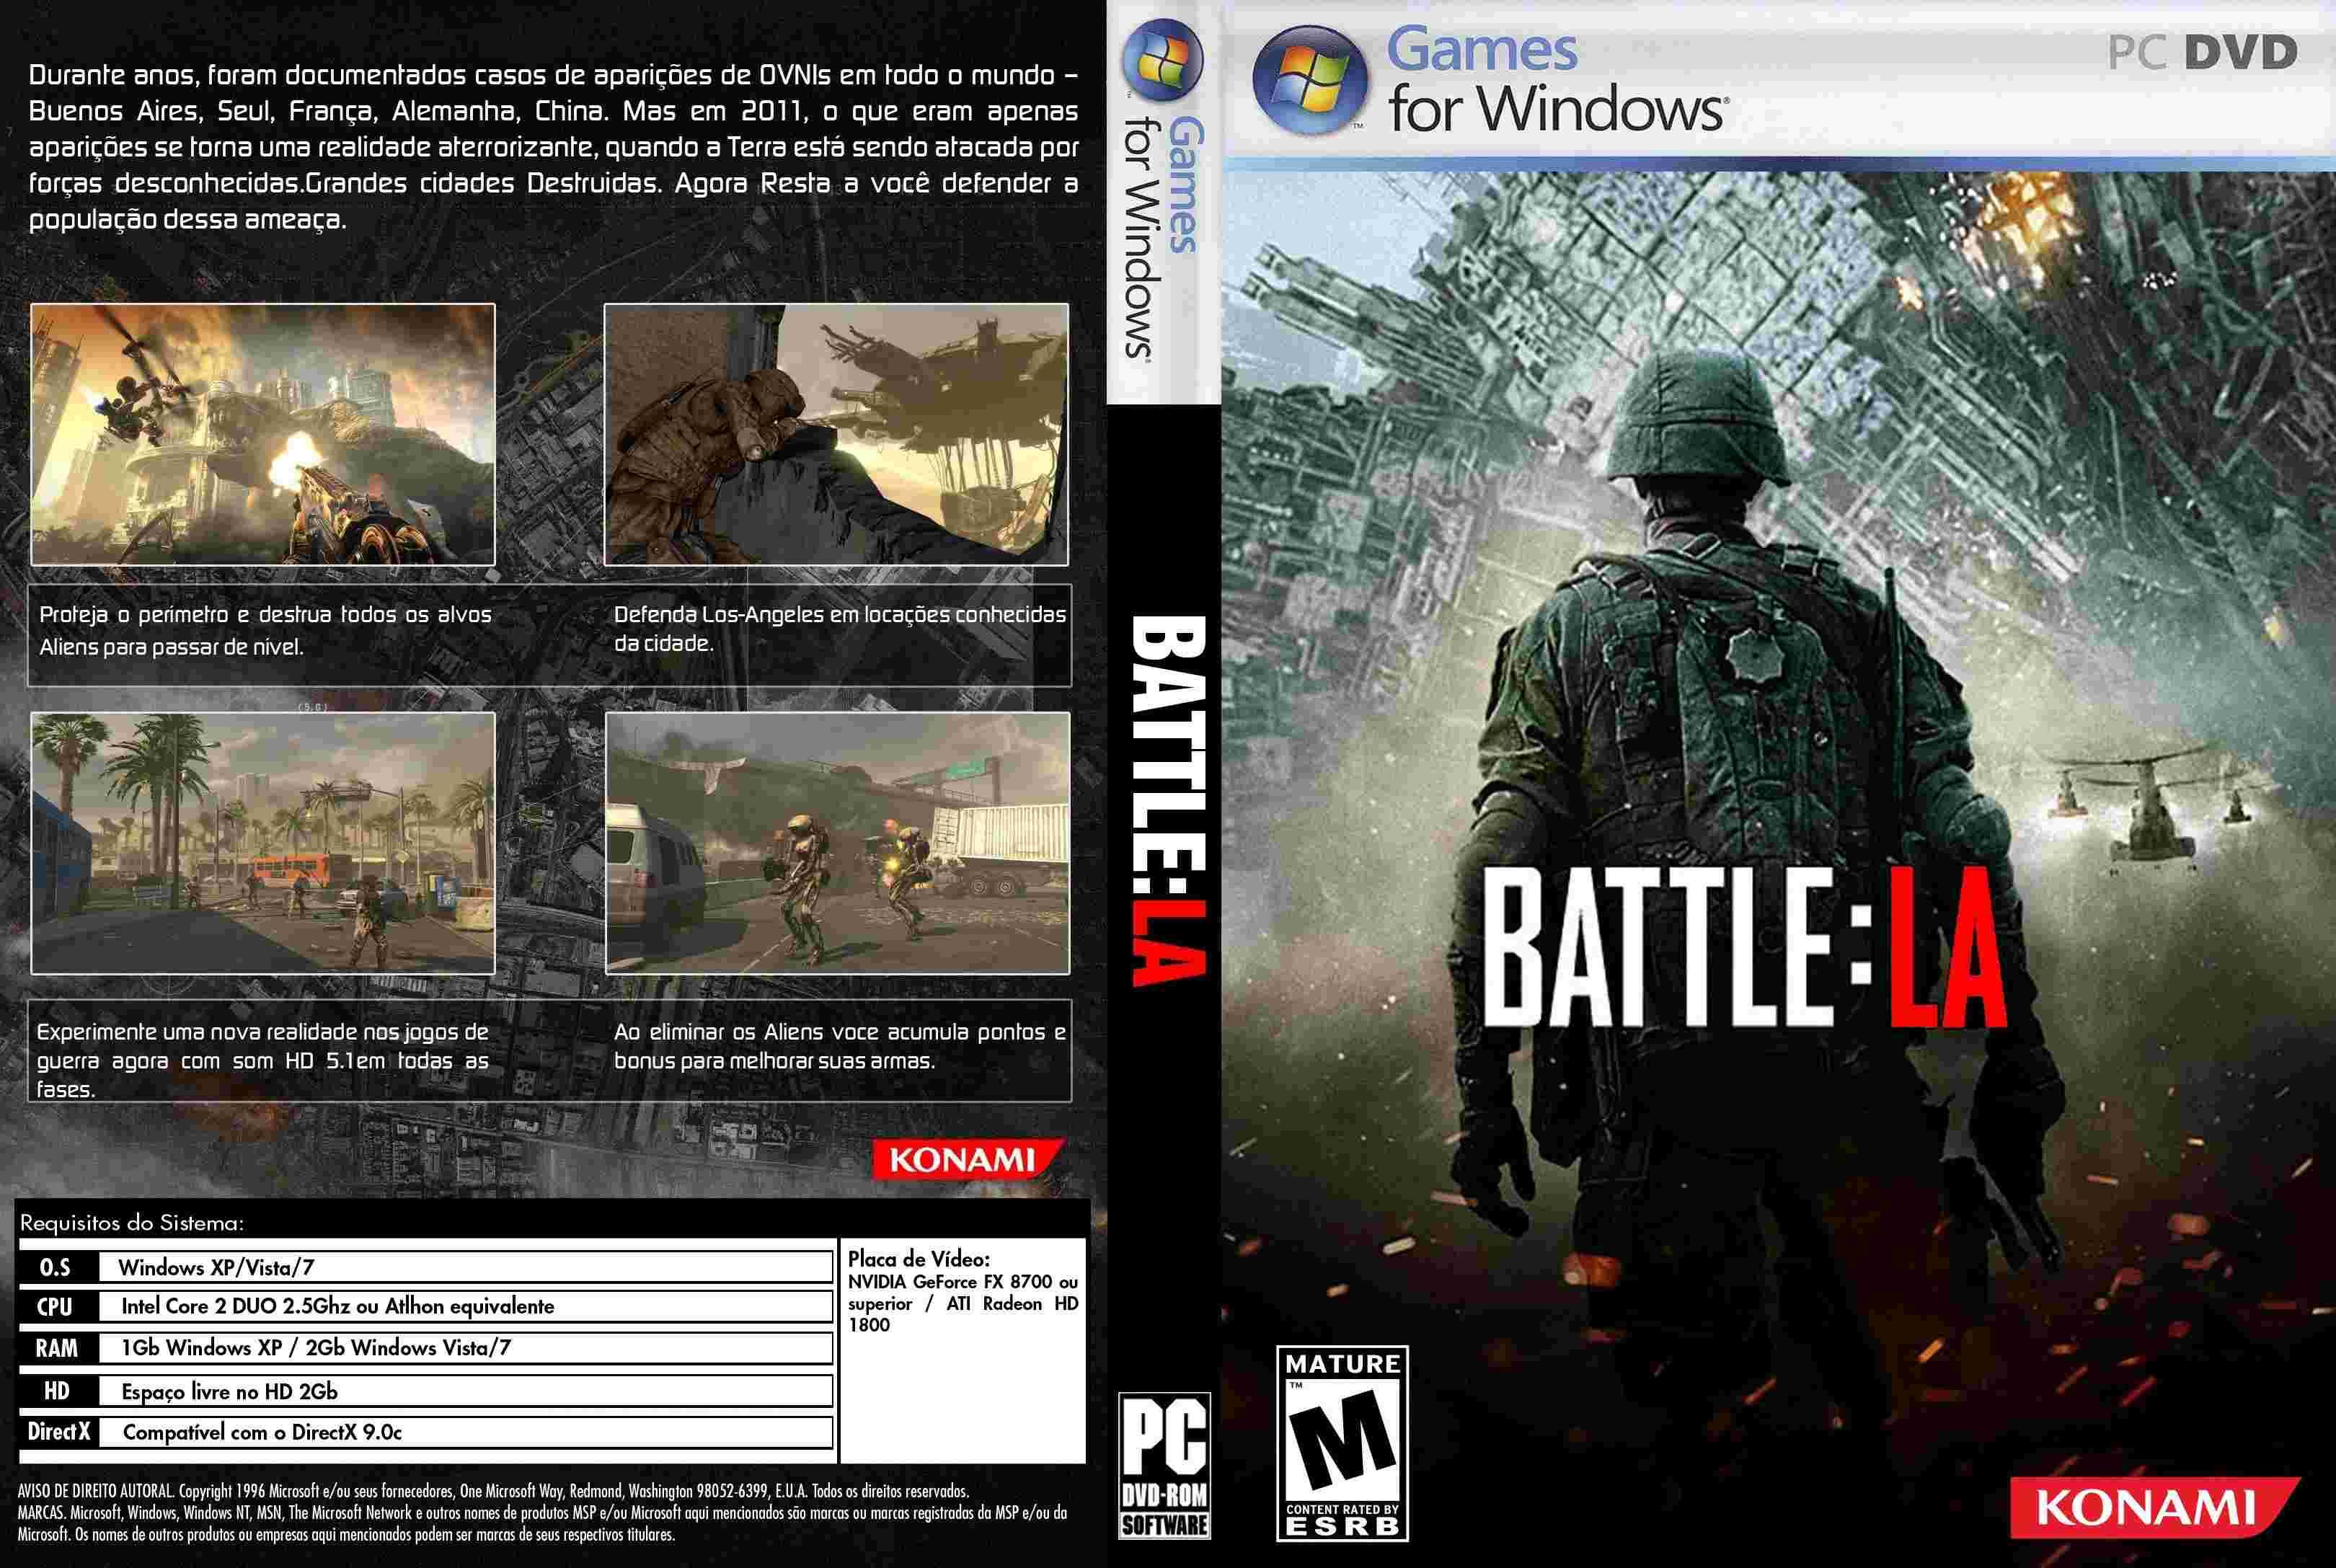 Battle los angeles pc game activation code